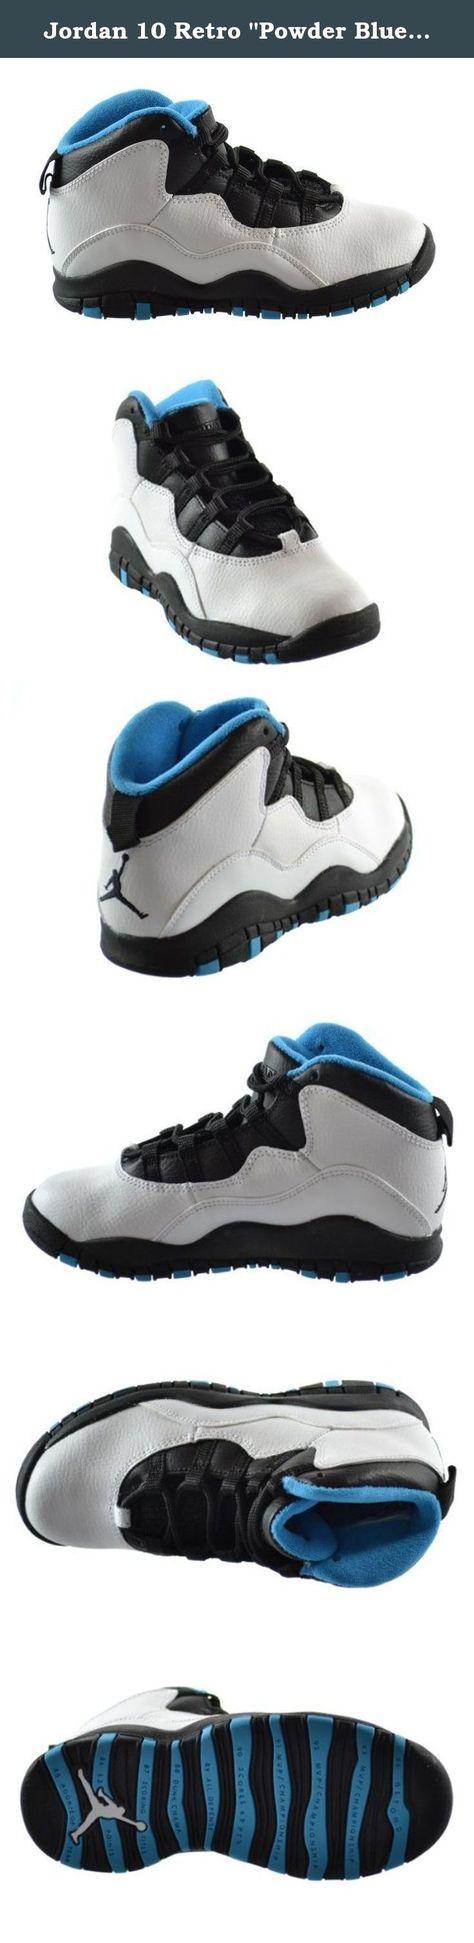 - 310807 106 White Dark Powder Black Trainers Kids Nike Jordan 10 Retro PS